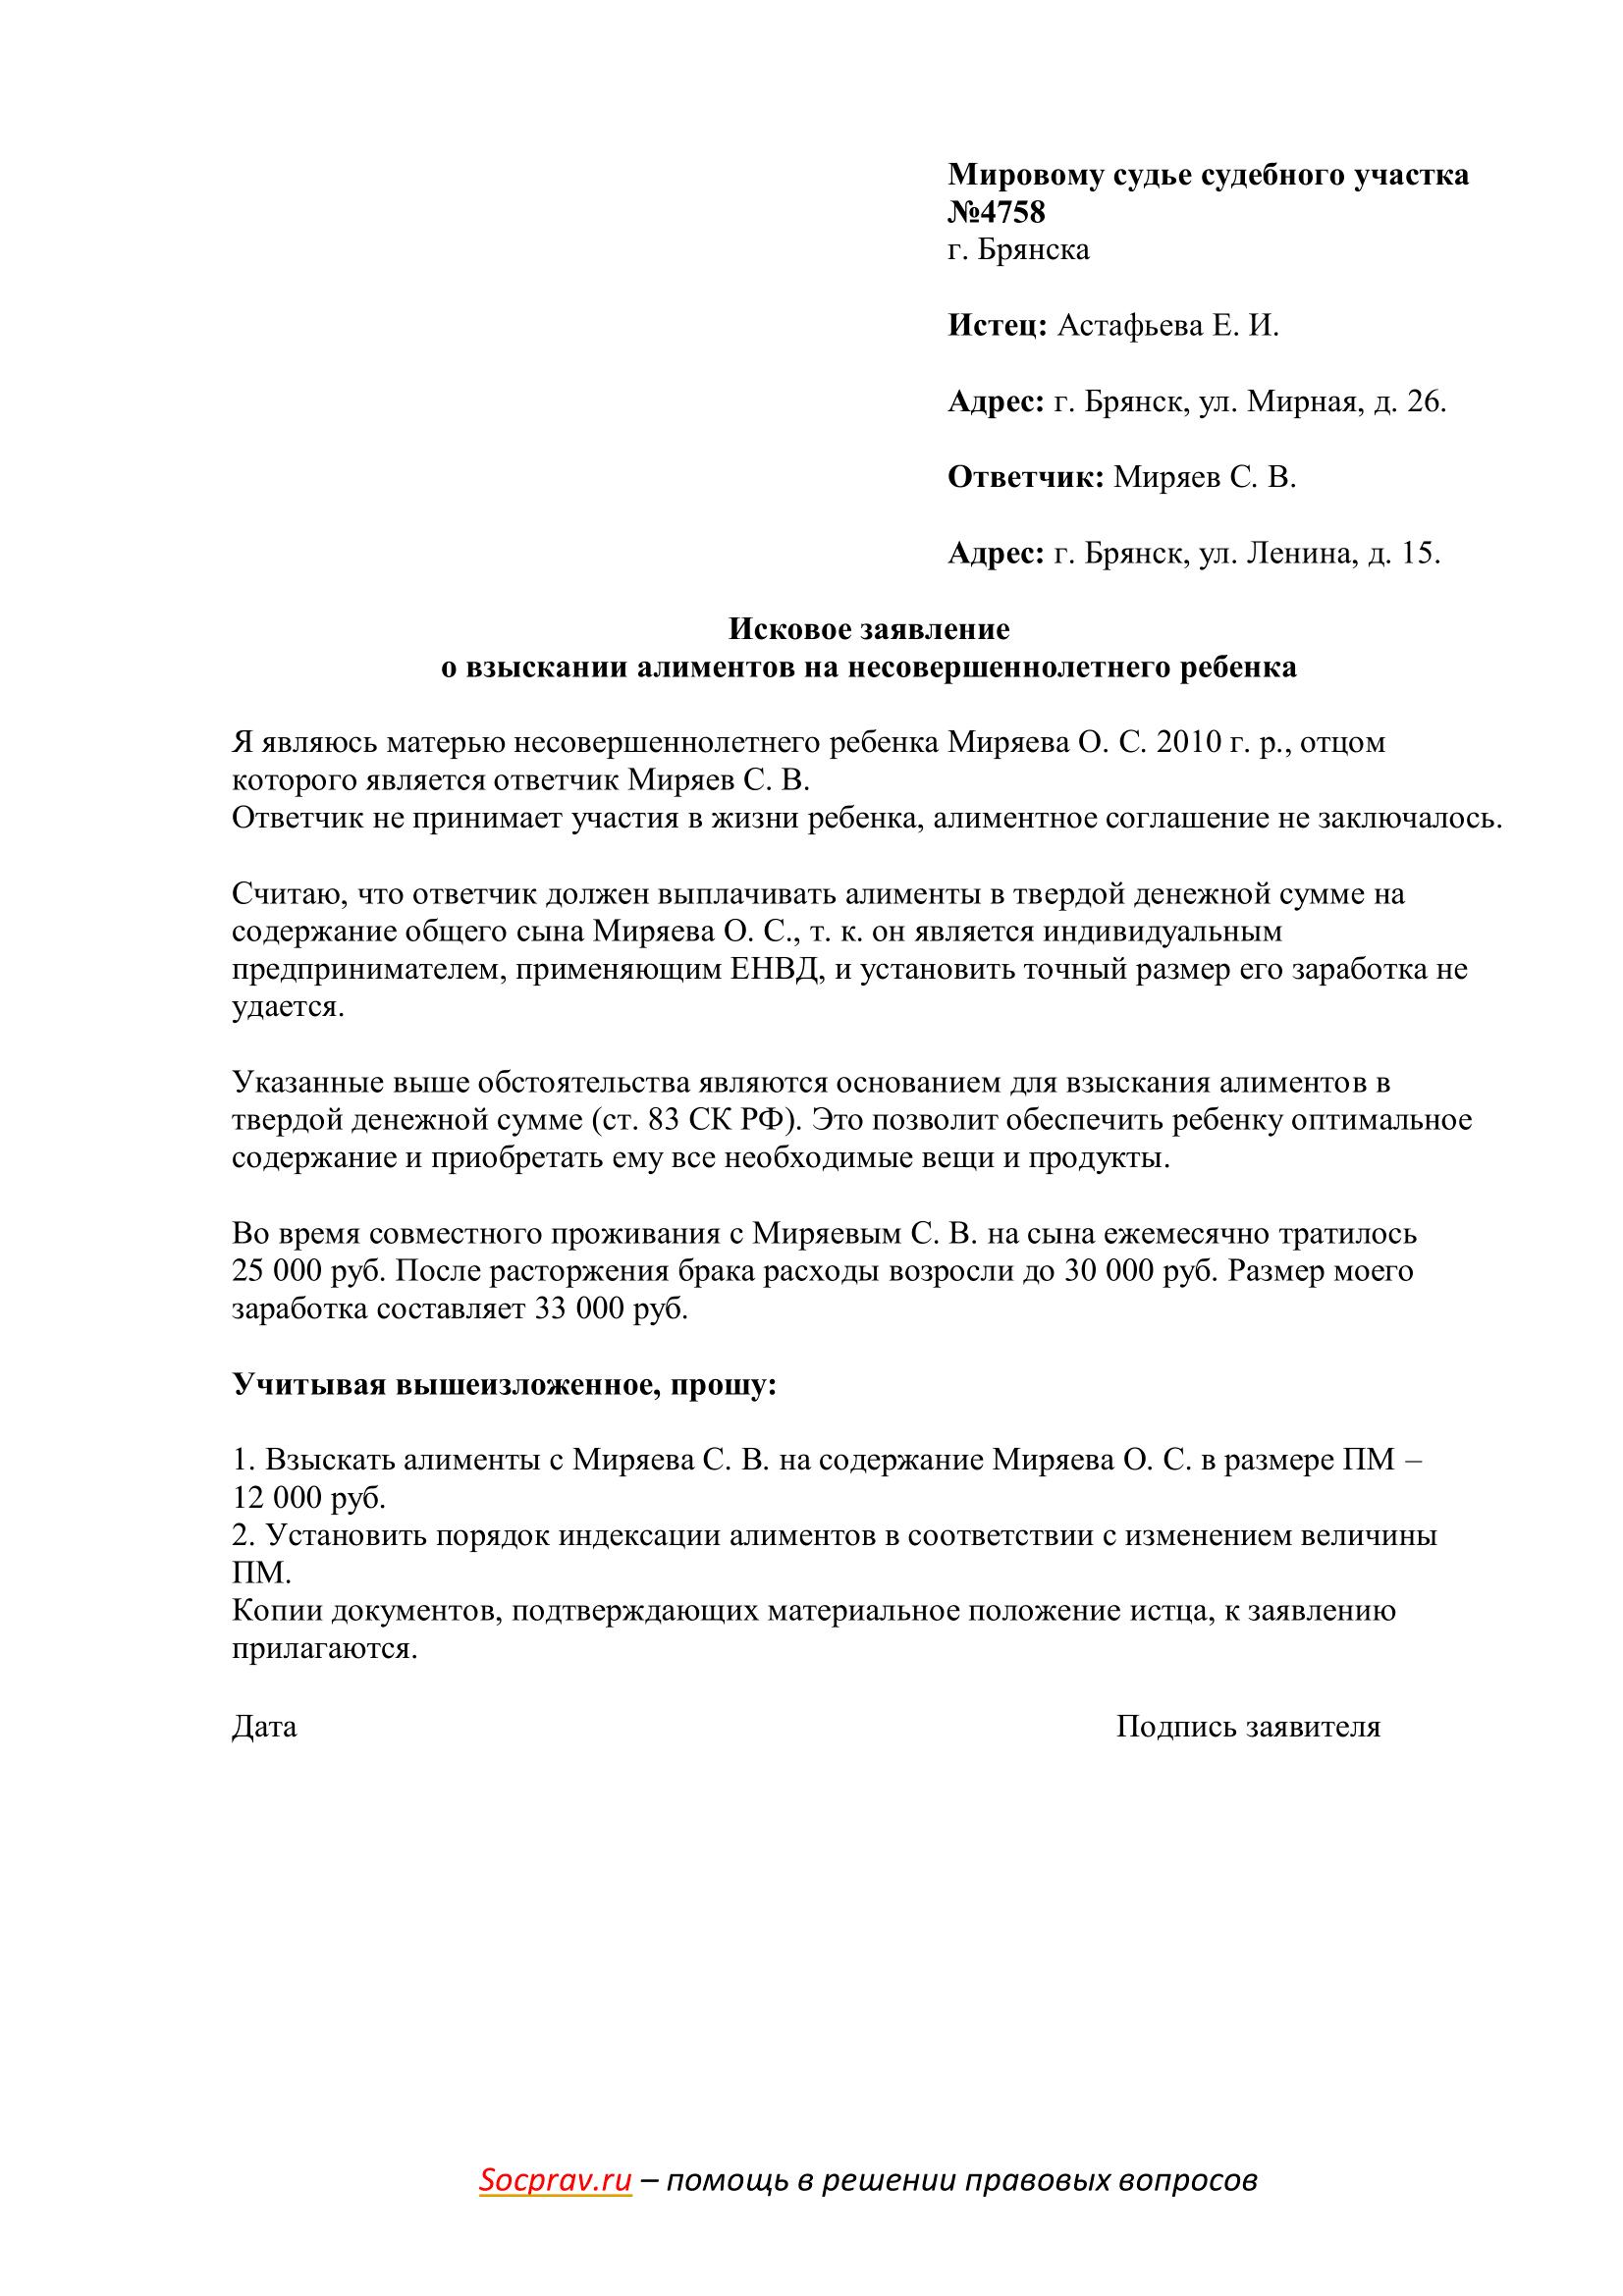 Исковое заявление о взыскании алиментов на ребенка с ИП в ТДС при ЕНВД